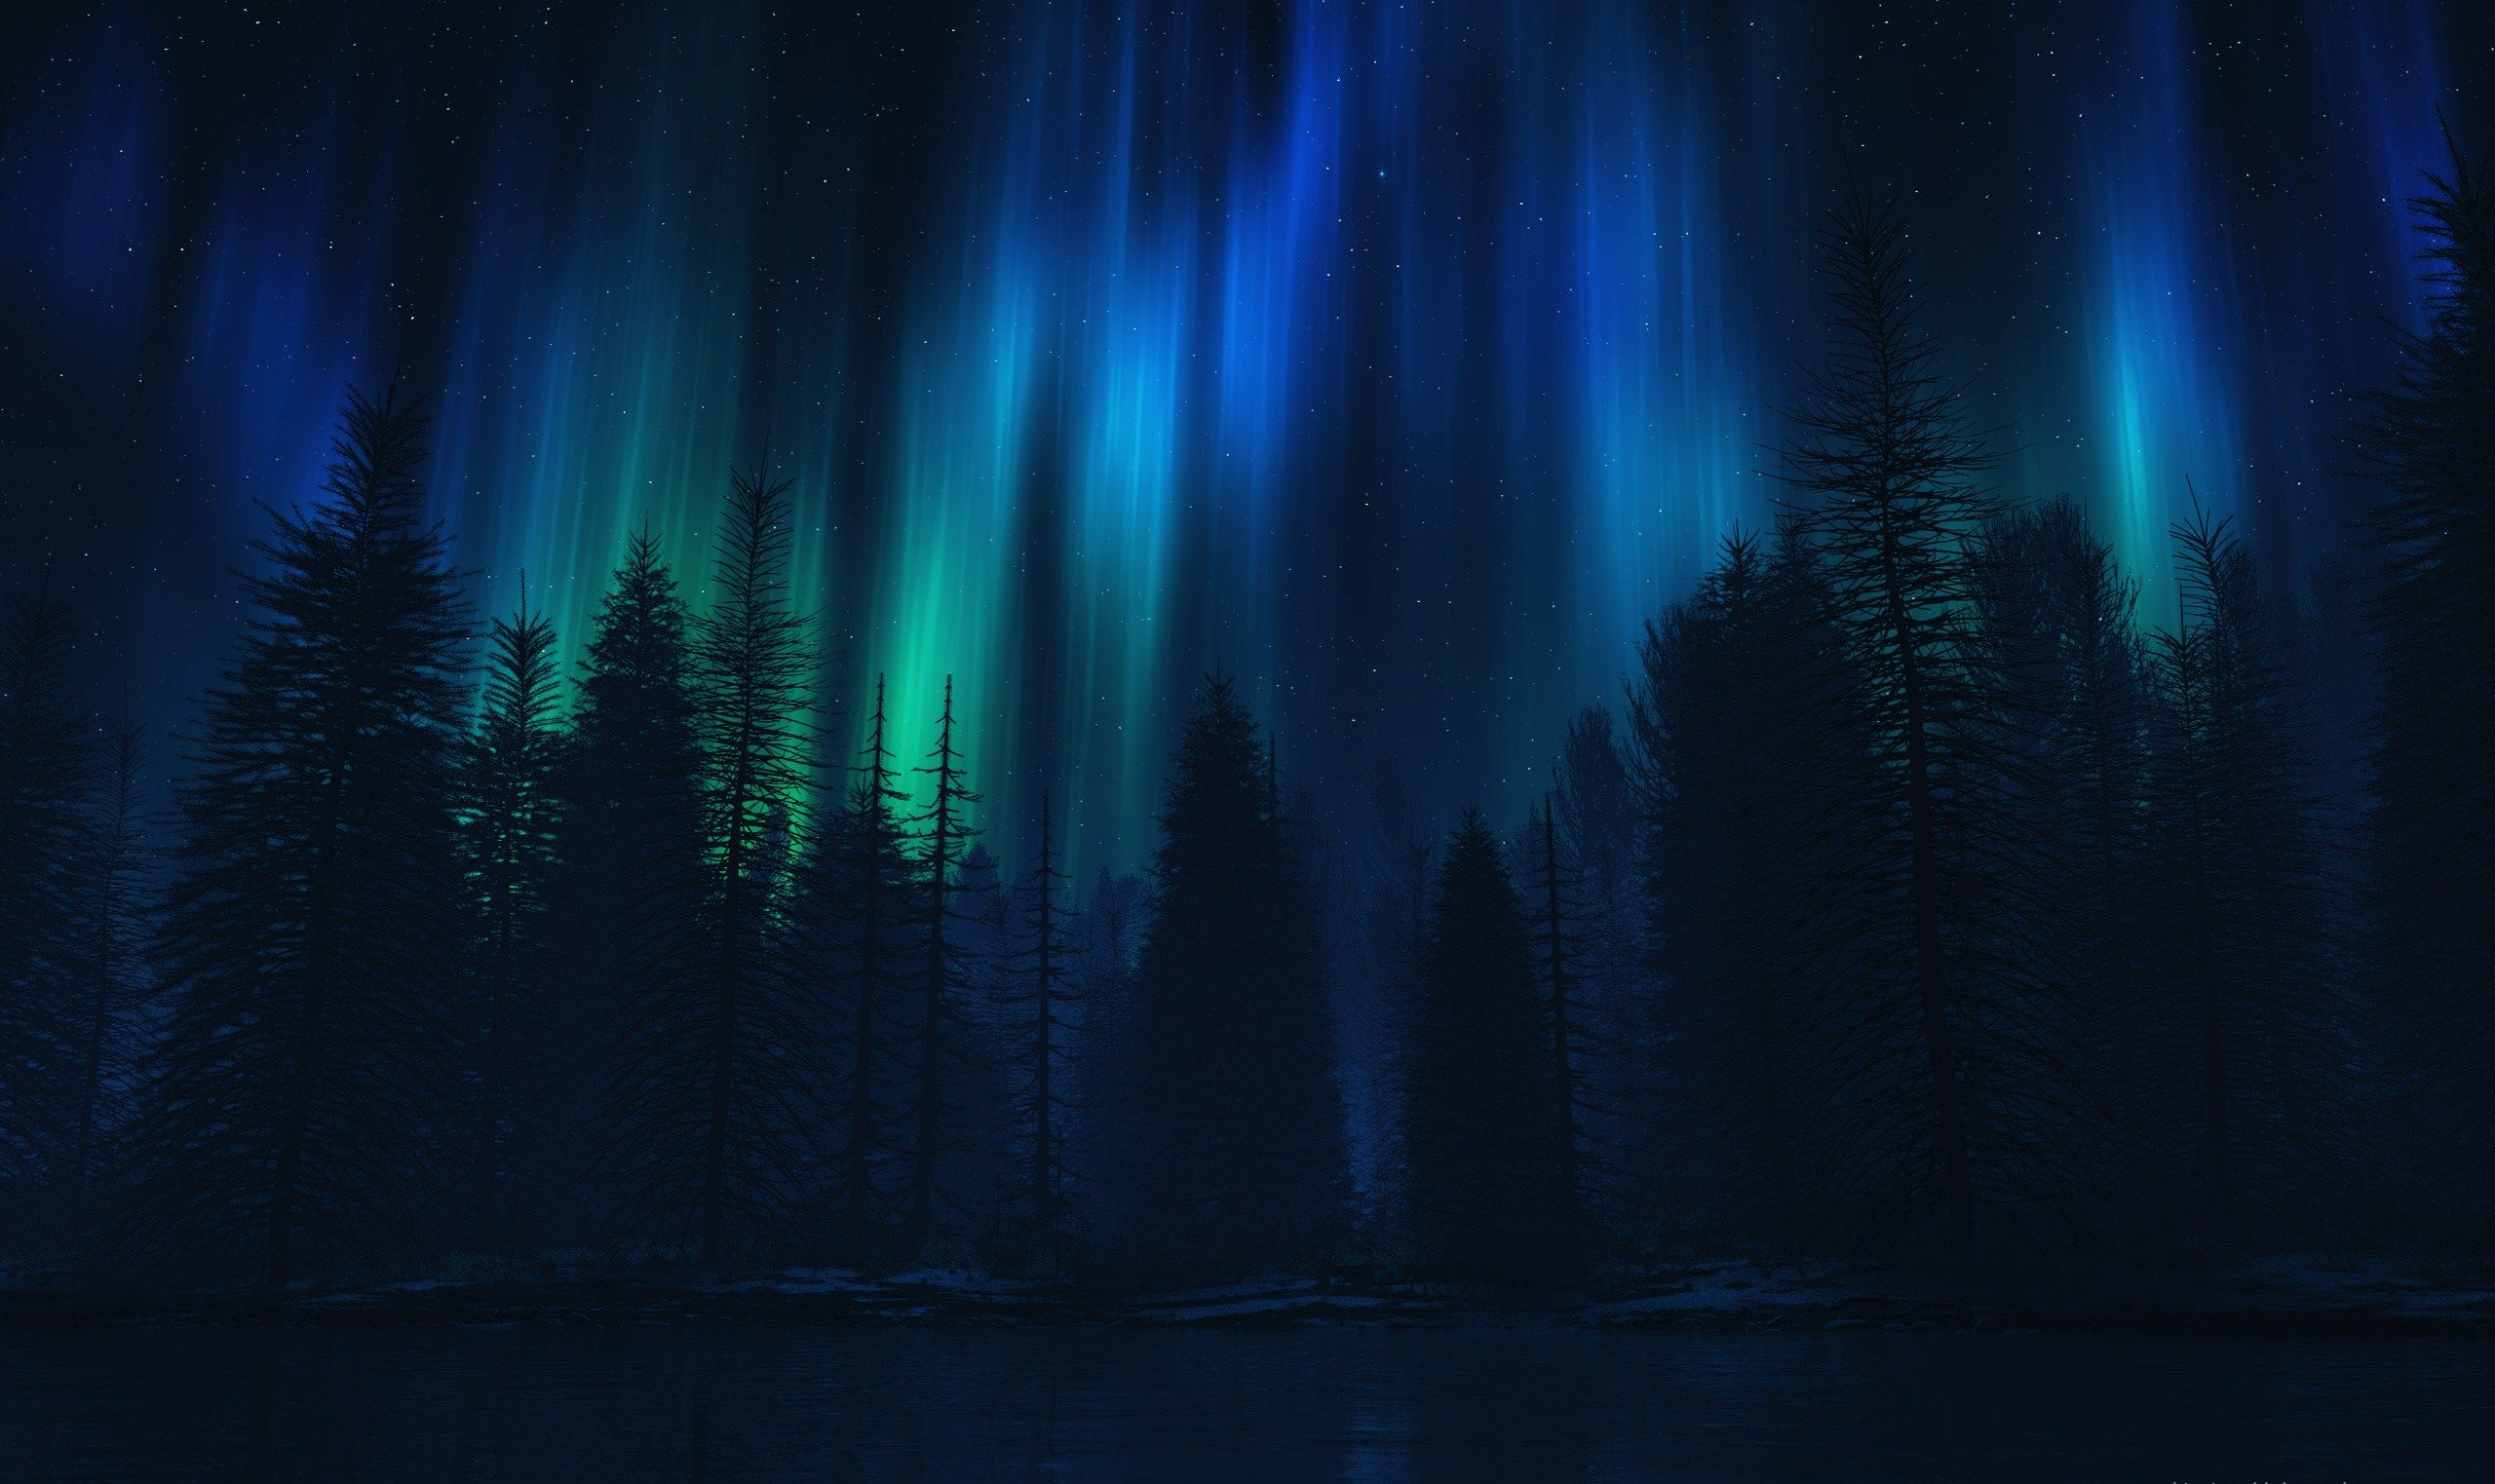 63+ Aurora Borealis Wallpaper Hd on WallpaperSafari